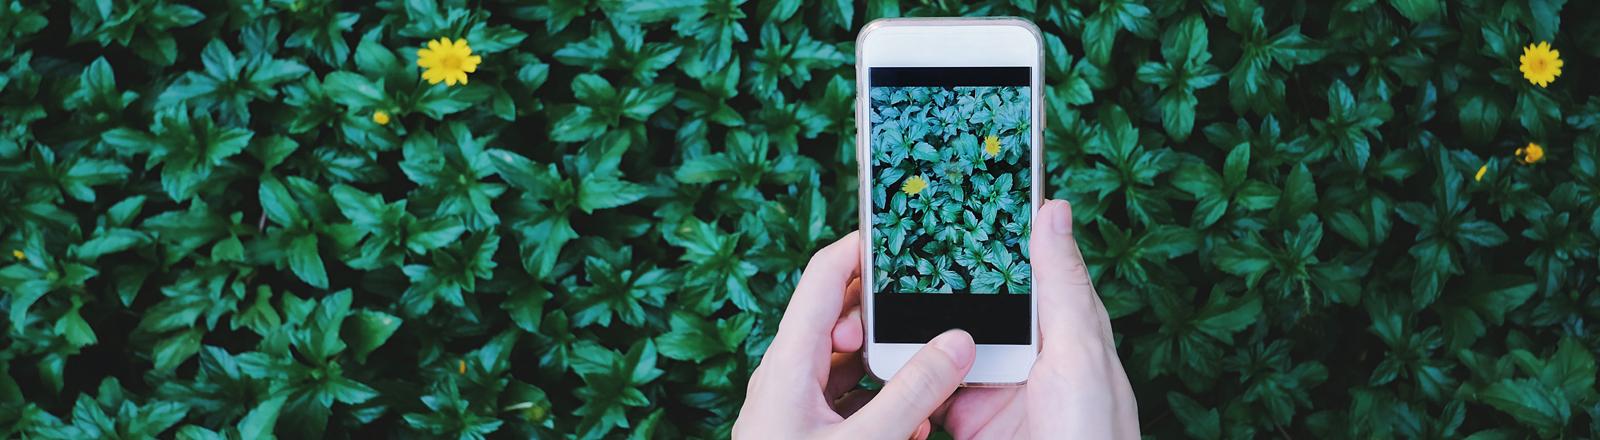 Smartphone fotografiert grüne Hecke